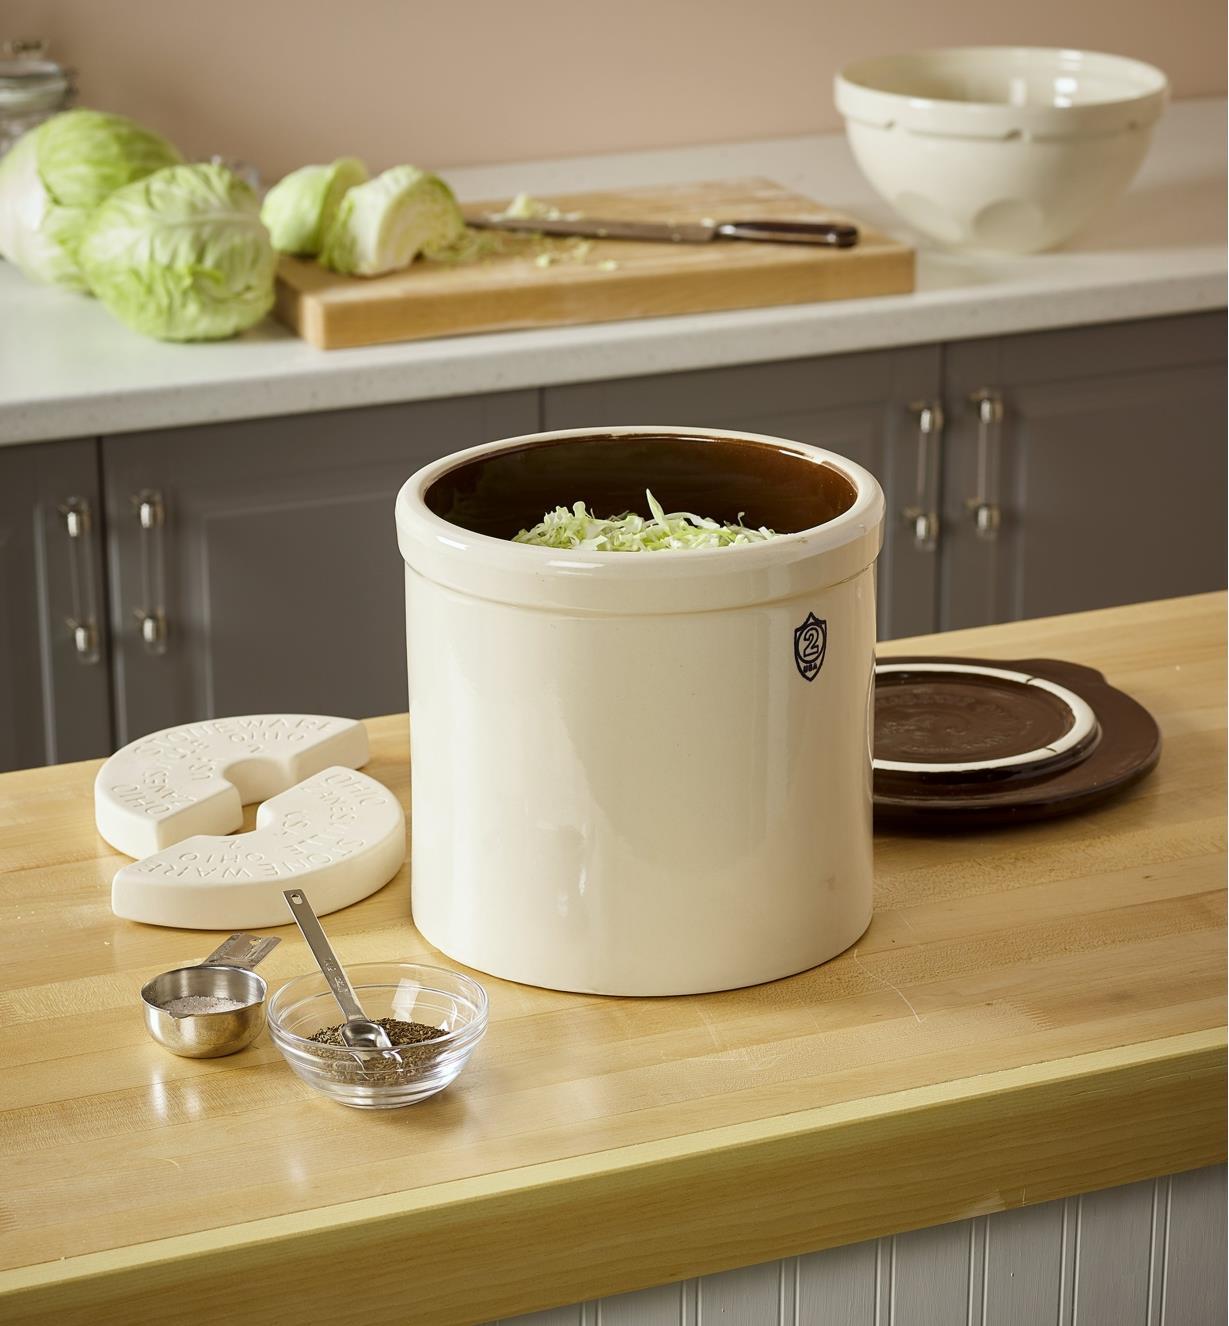 Fermentation crock set on a countertop